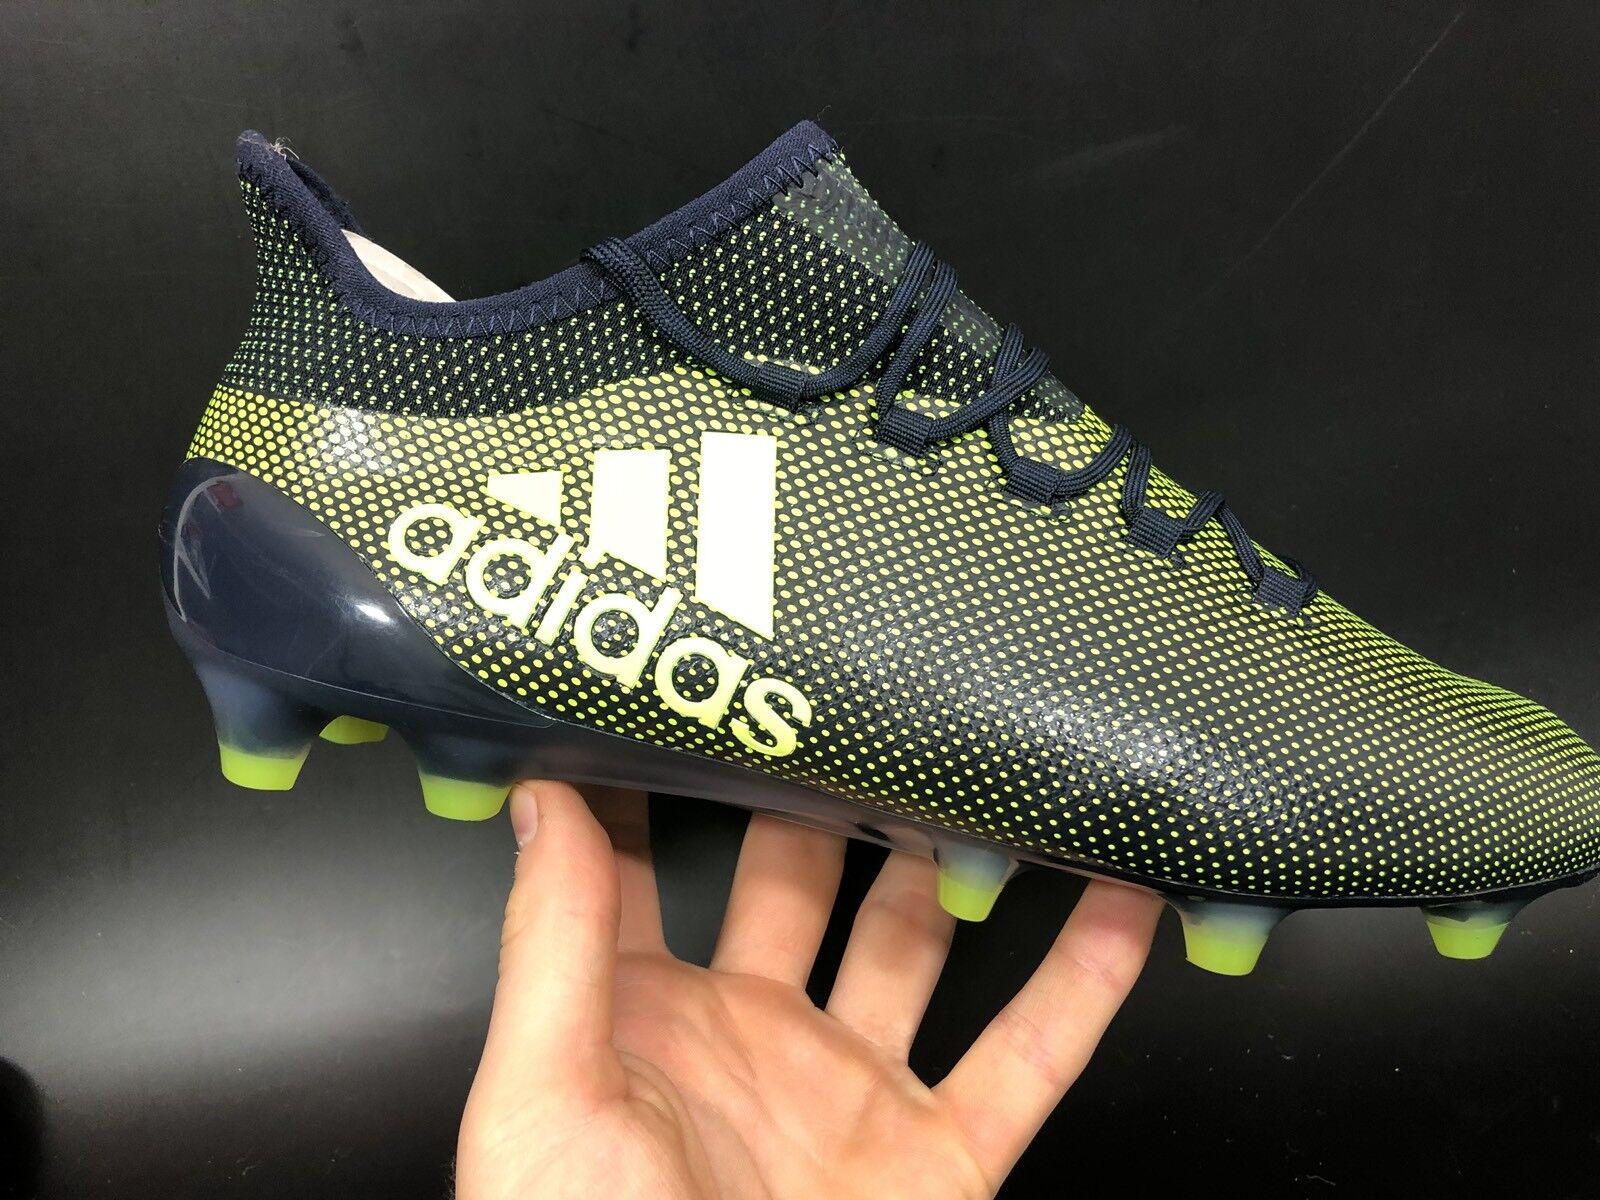 Adidas X 17.1 Terreno Firme botas Talla8.5 US9 CG3664